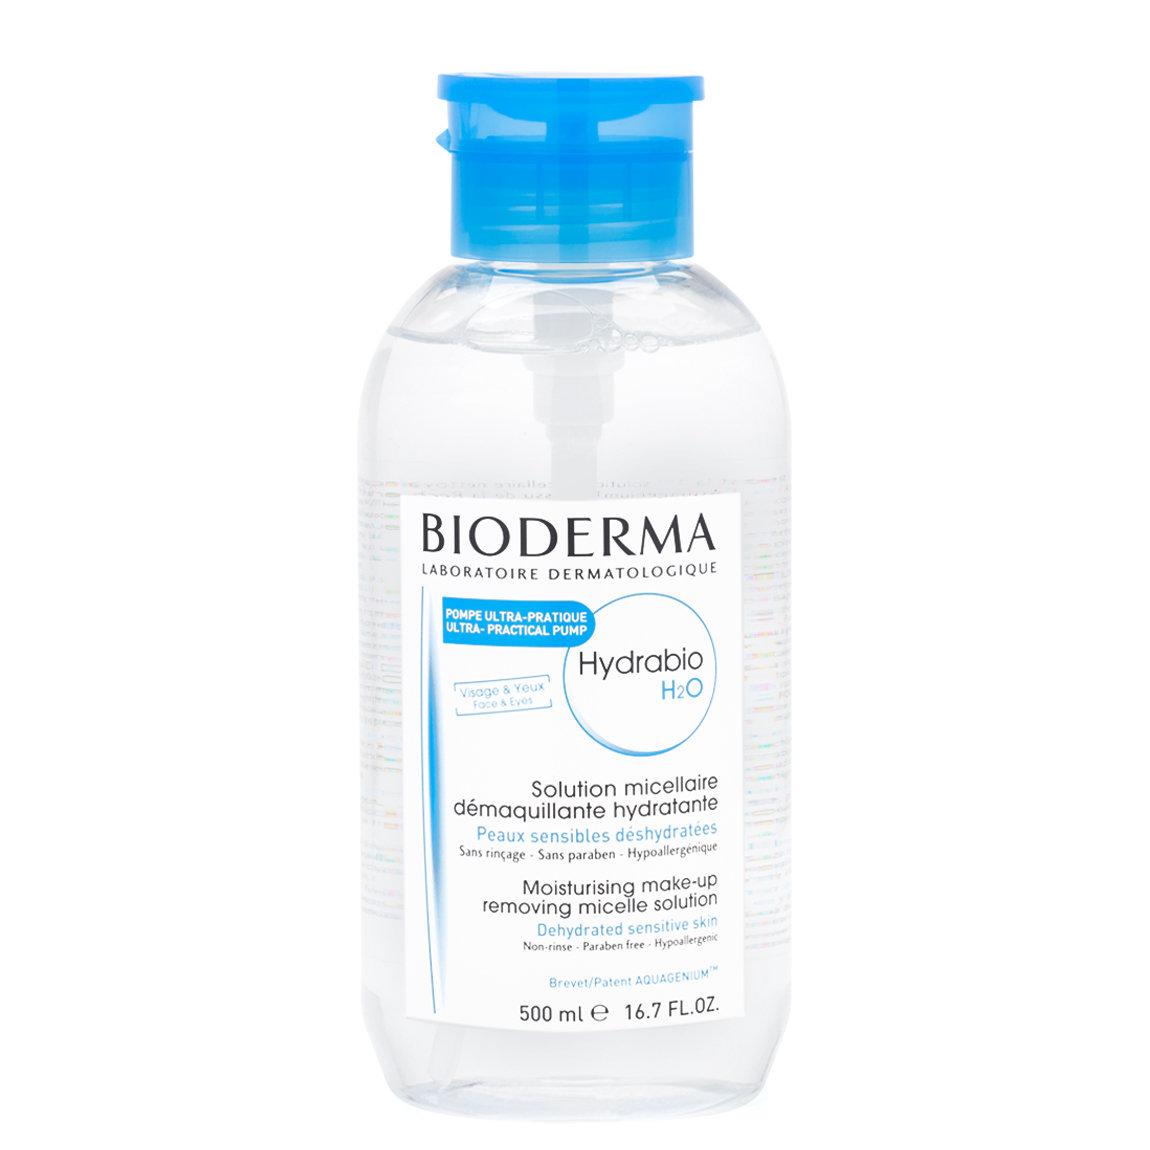 Bioderma Hydrabio H2O Pump 500 ml alternative view 1 - product swatch.